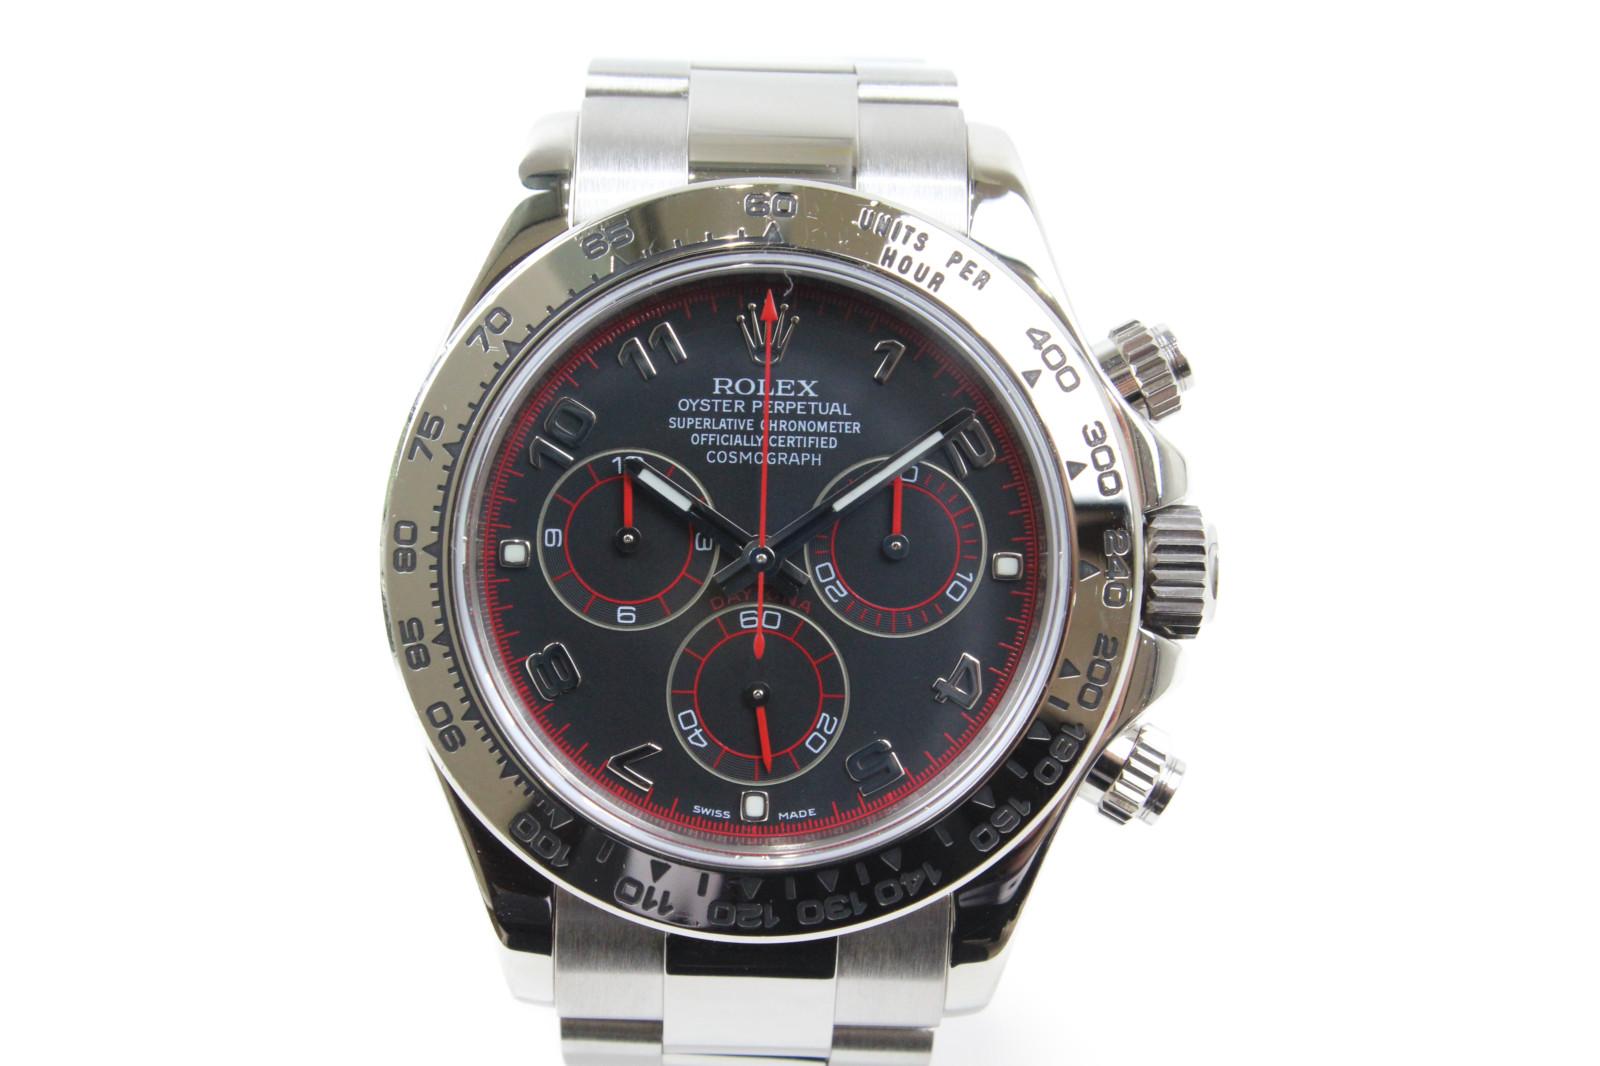 ROLEX ロレックス デイトナ 116509 自動巻き クロノグラフ K18WG無垢 ホワイトゴールド ブラック レッド メンズ 腕時計【中古】